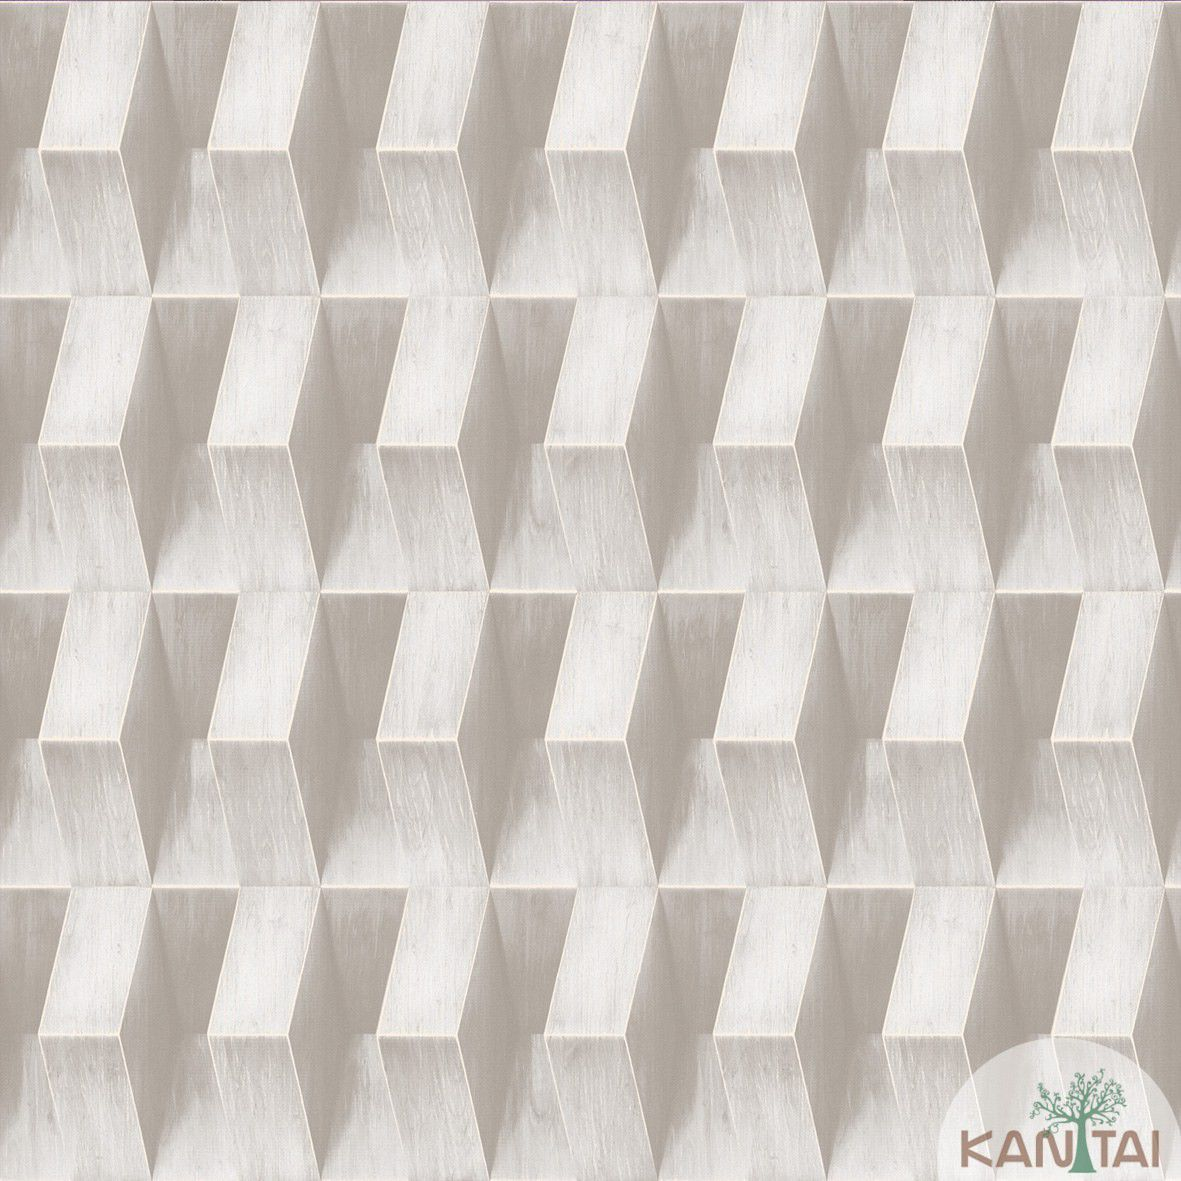 Papel de Parede   Kan Tai Vinilico Coleção Neonature III 3D Geométrico Cinza, Creme